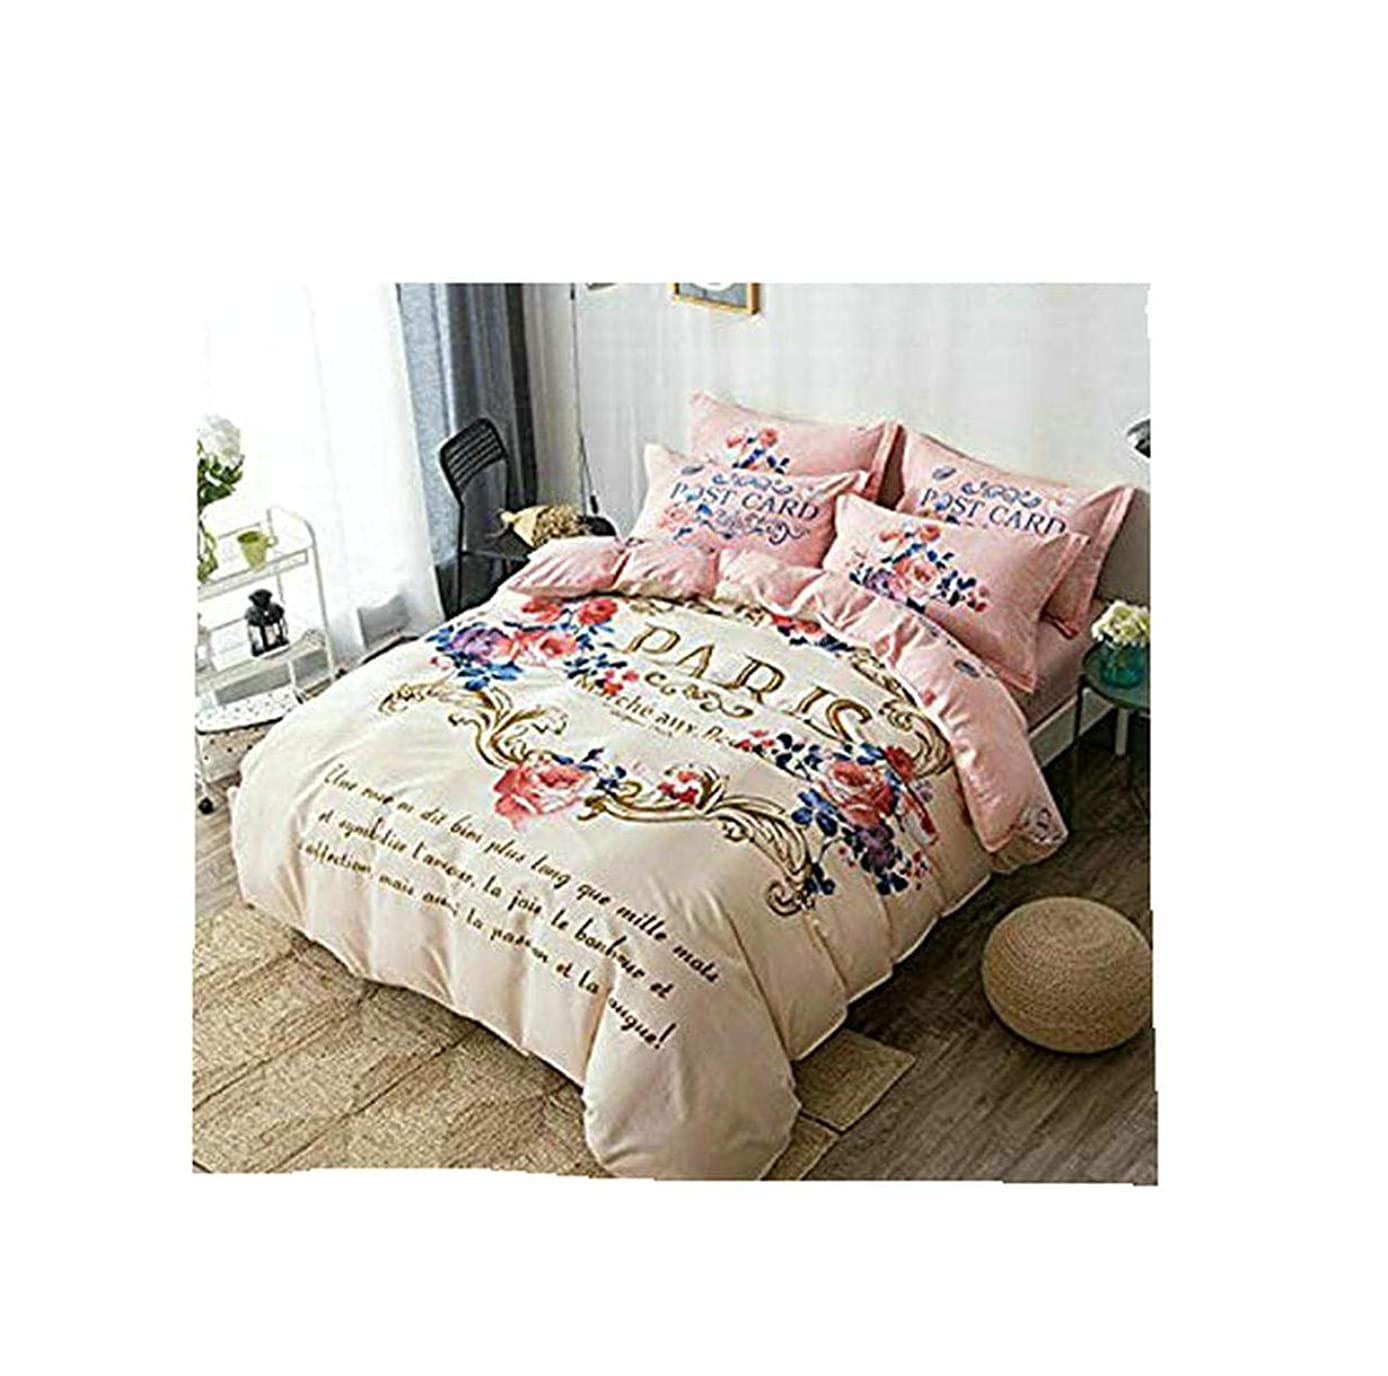 Bed Set 100% Cotton Flower Print 3pc/4pc Bedding Sheet Set Duvet Cover Pillow Cases Full Size 78